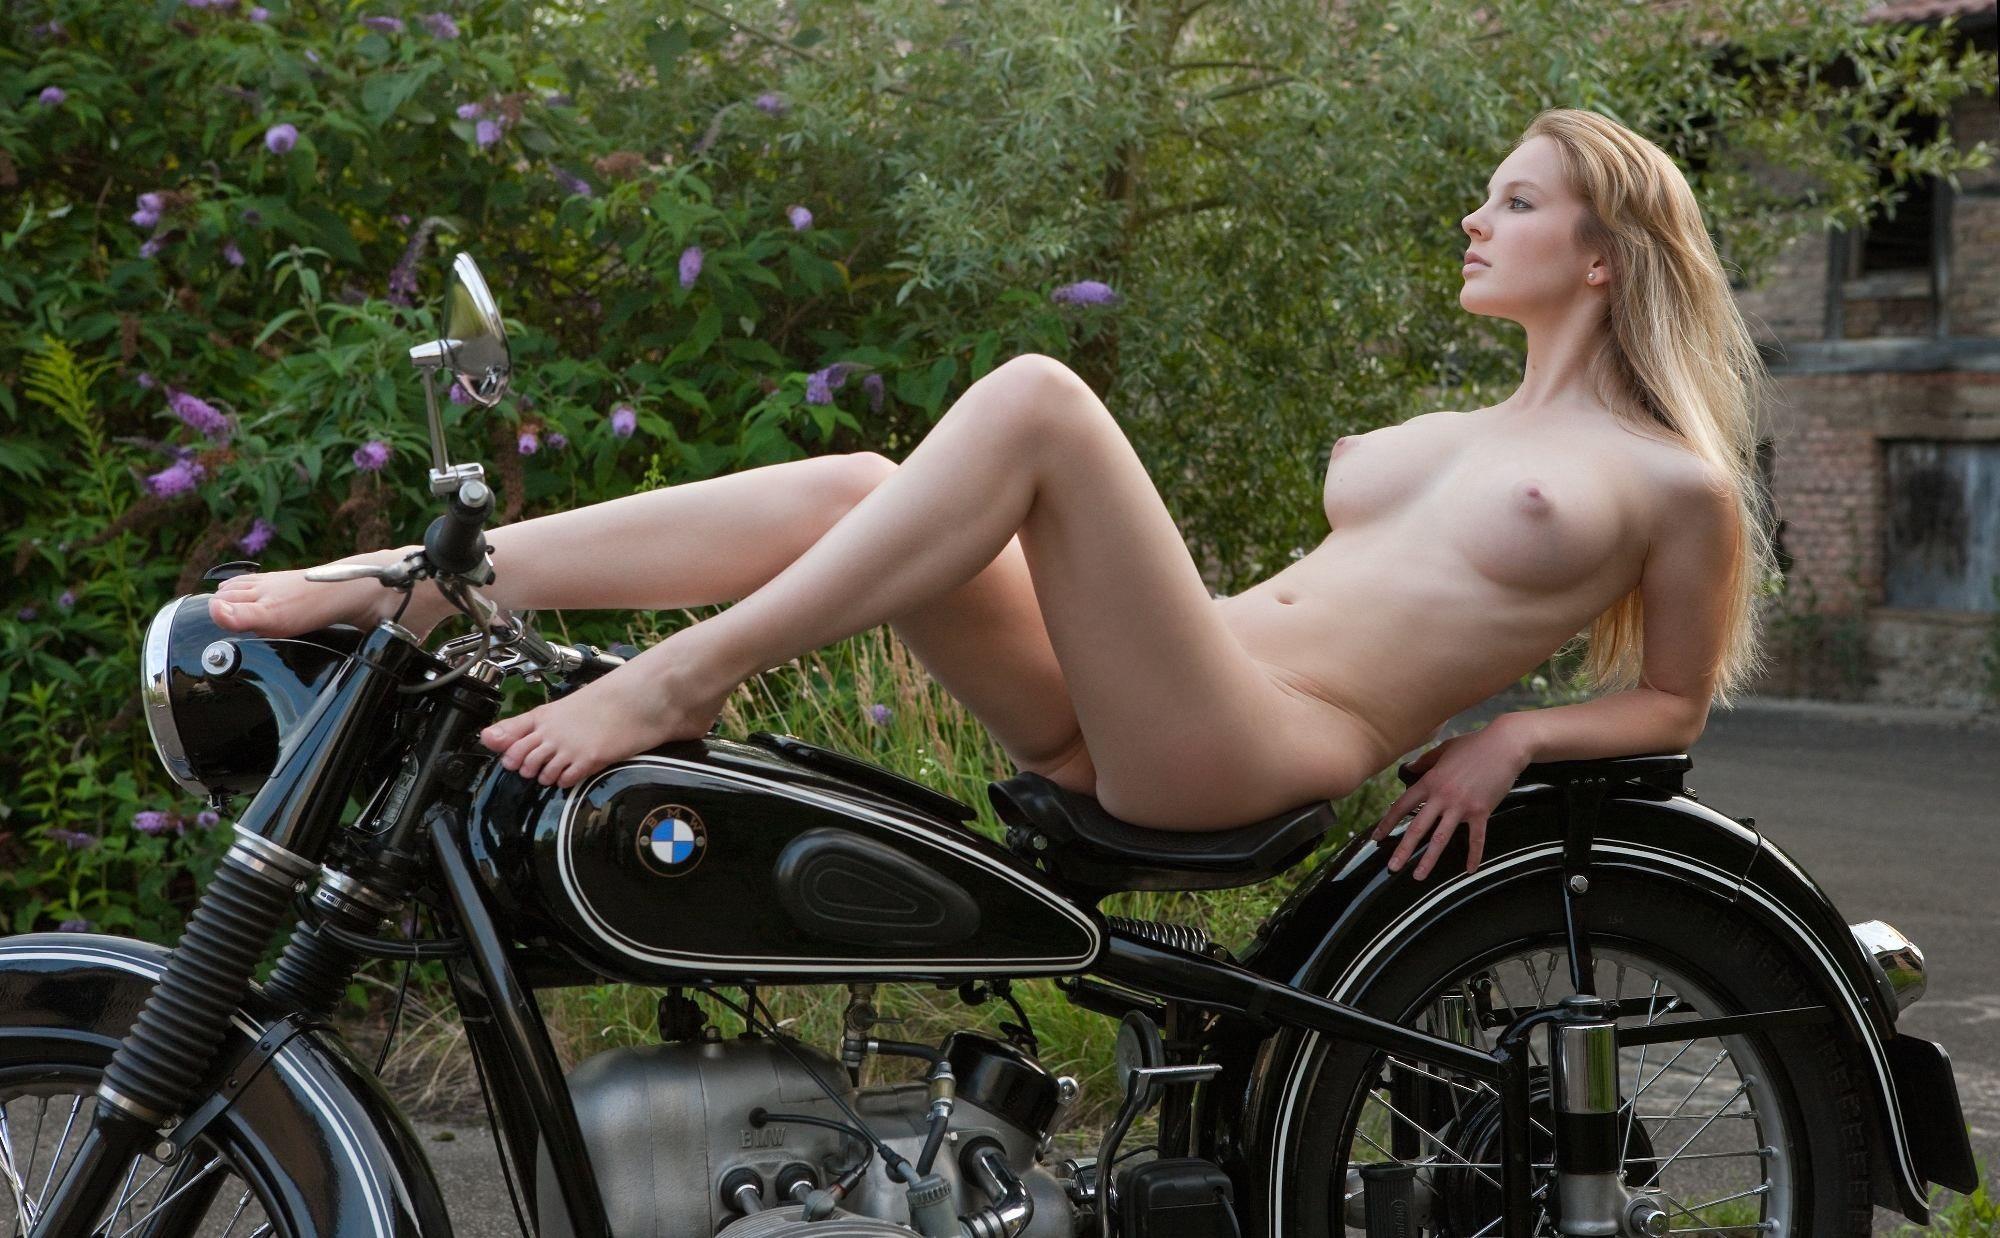 Голые бляди на мотоциклах — photo 13